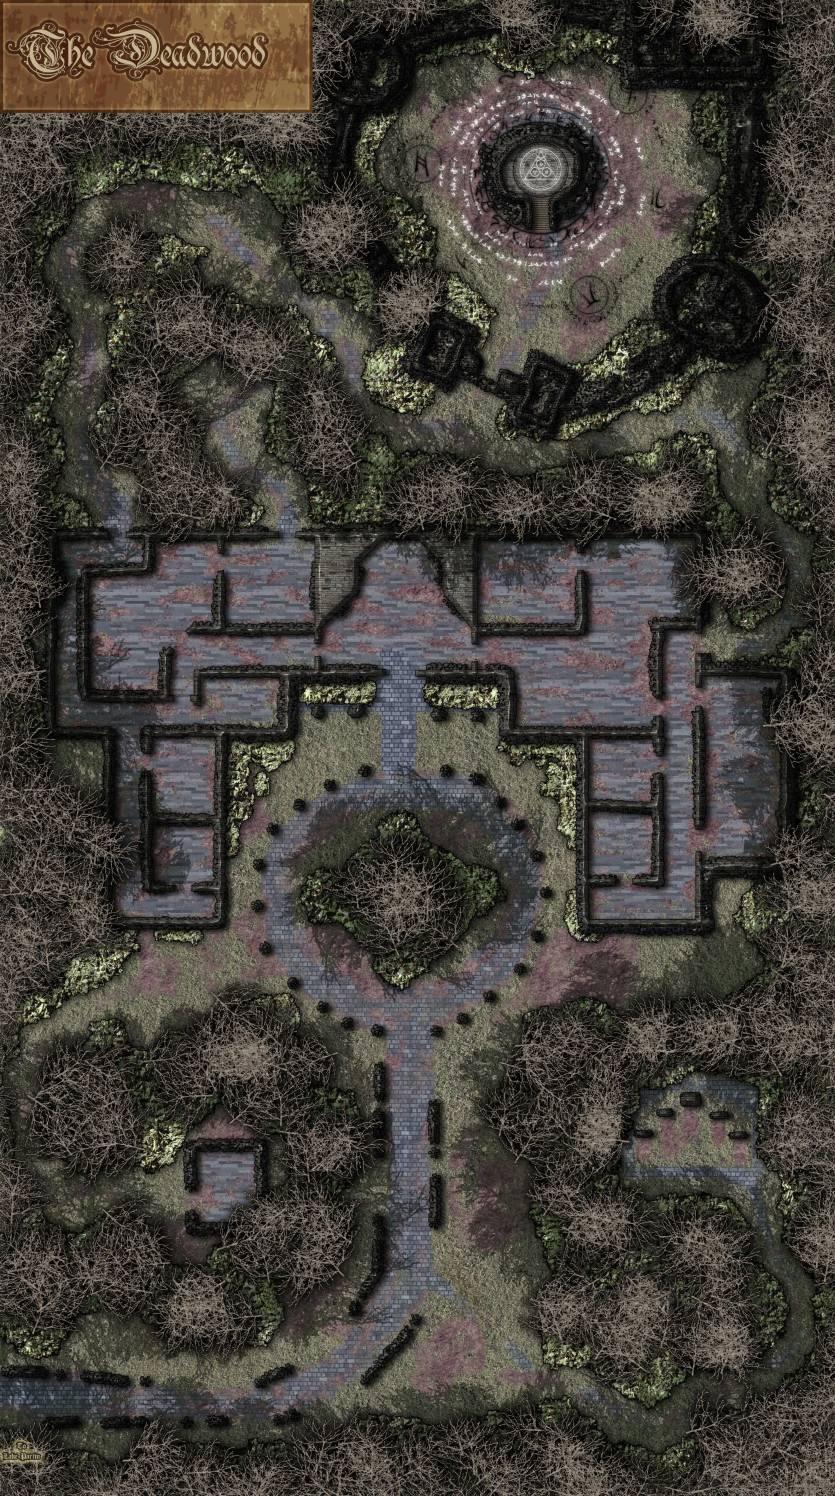 The Deadwood and Manor Blackbriar